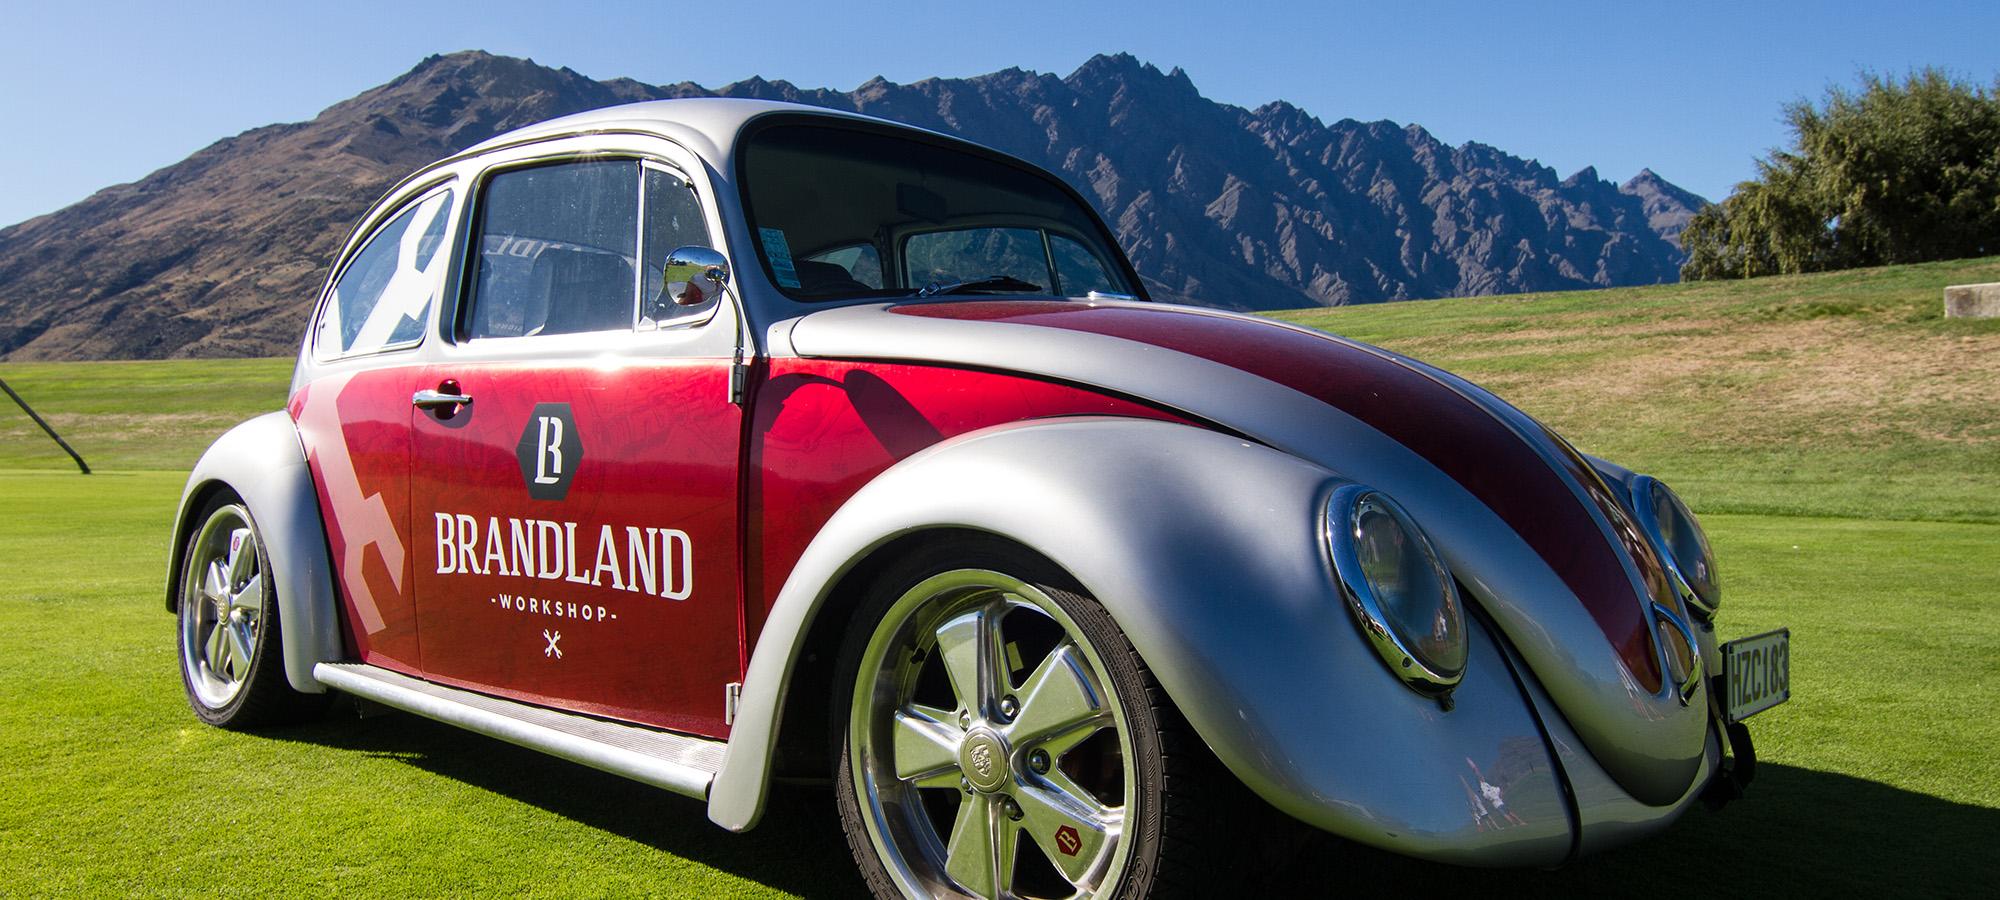 Brandland VW Beetle